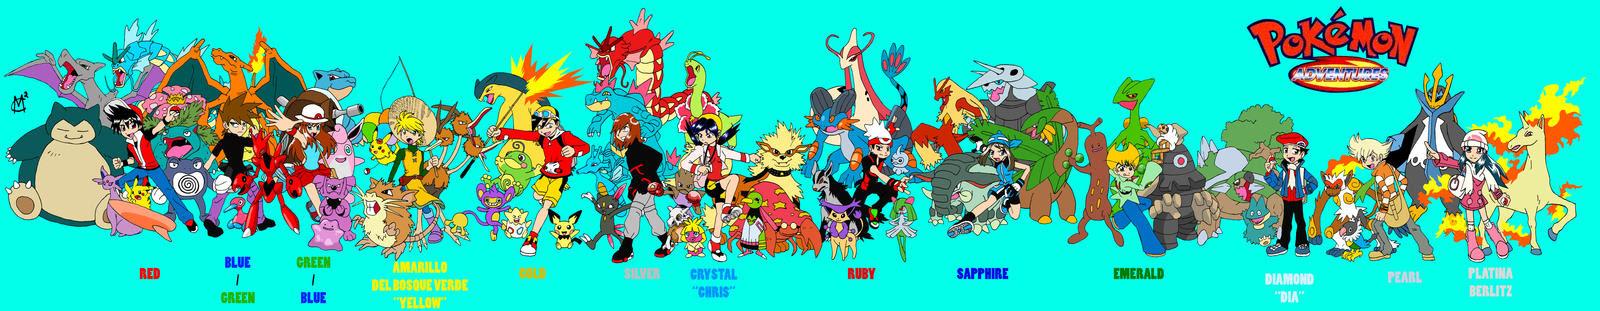 quot;Pokemon Adventuresquot; cast by EmSeeSquared on DeviantArt